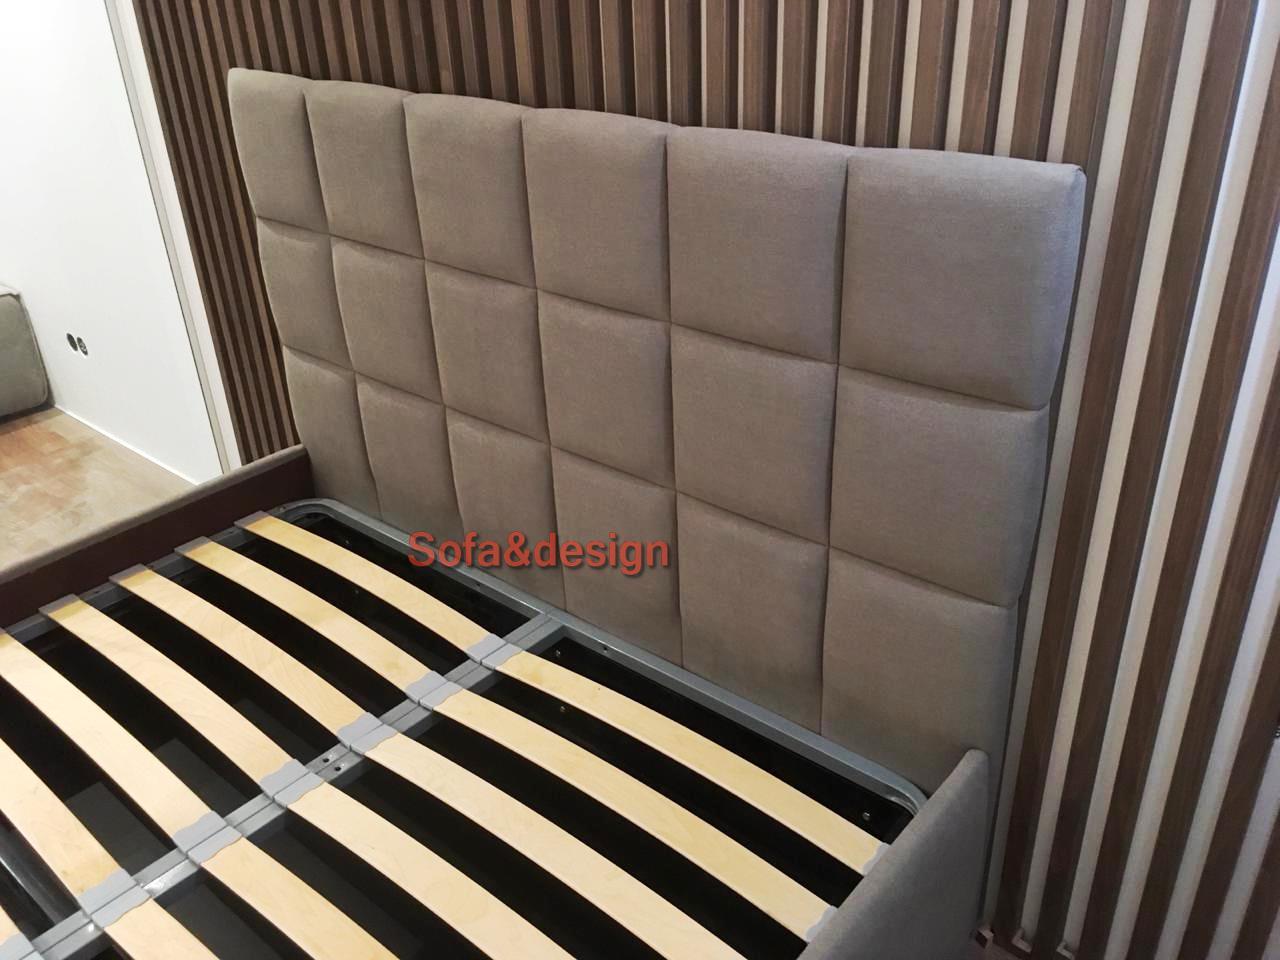 r4r - Перетяжка мягкой мебели